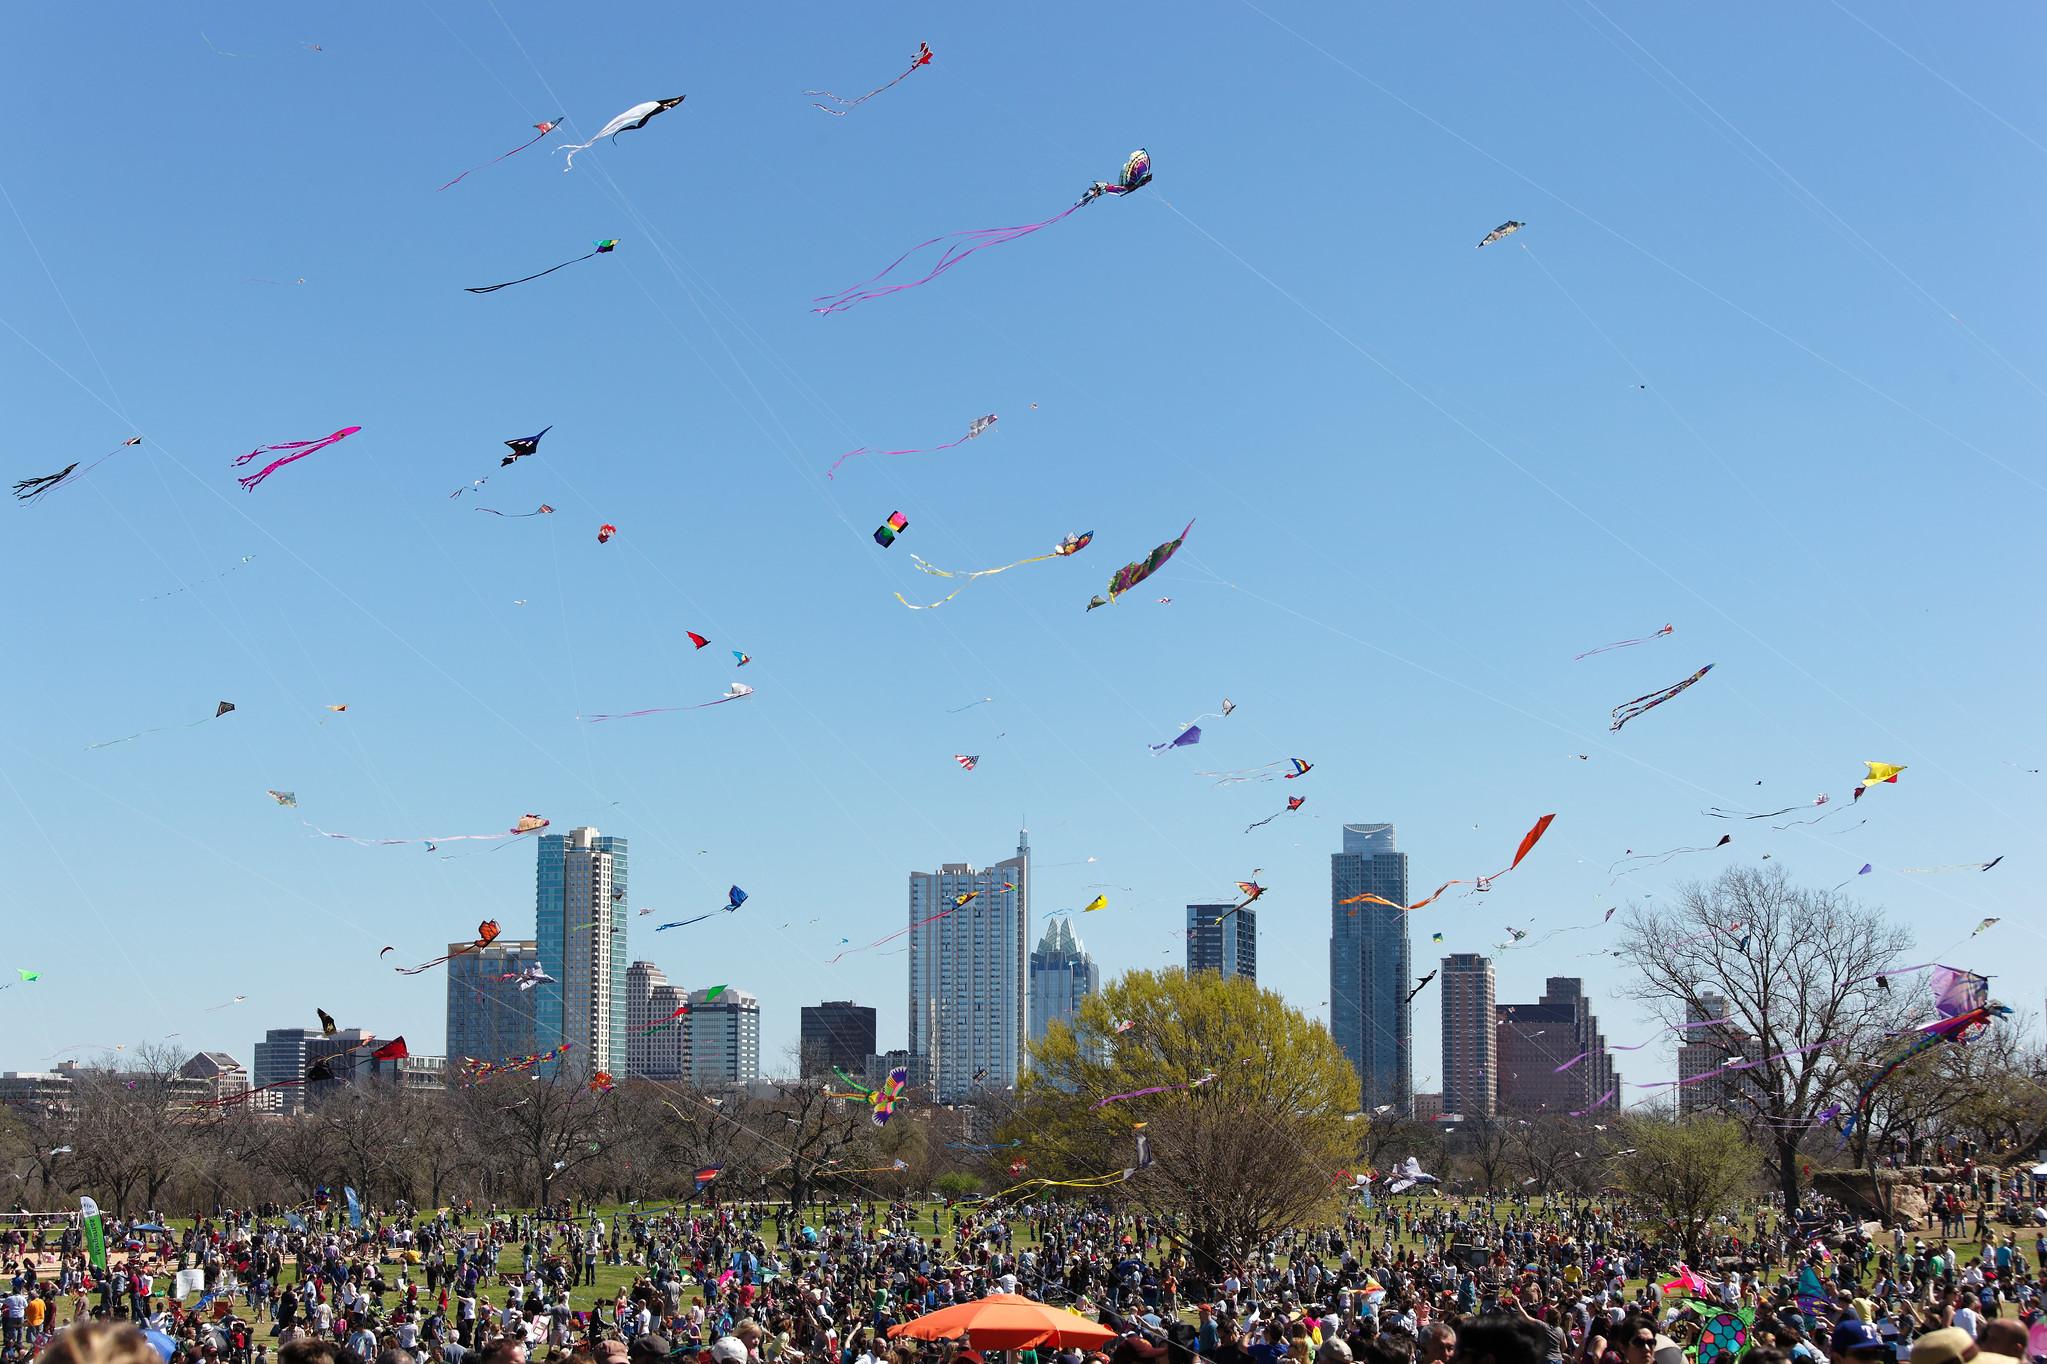 Kites over Austin